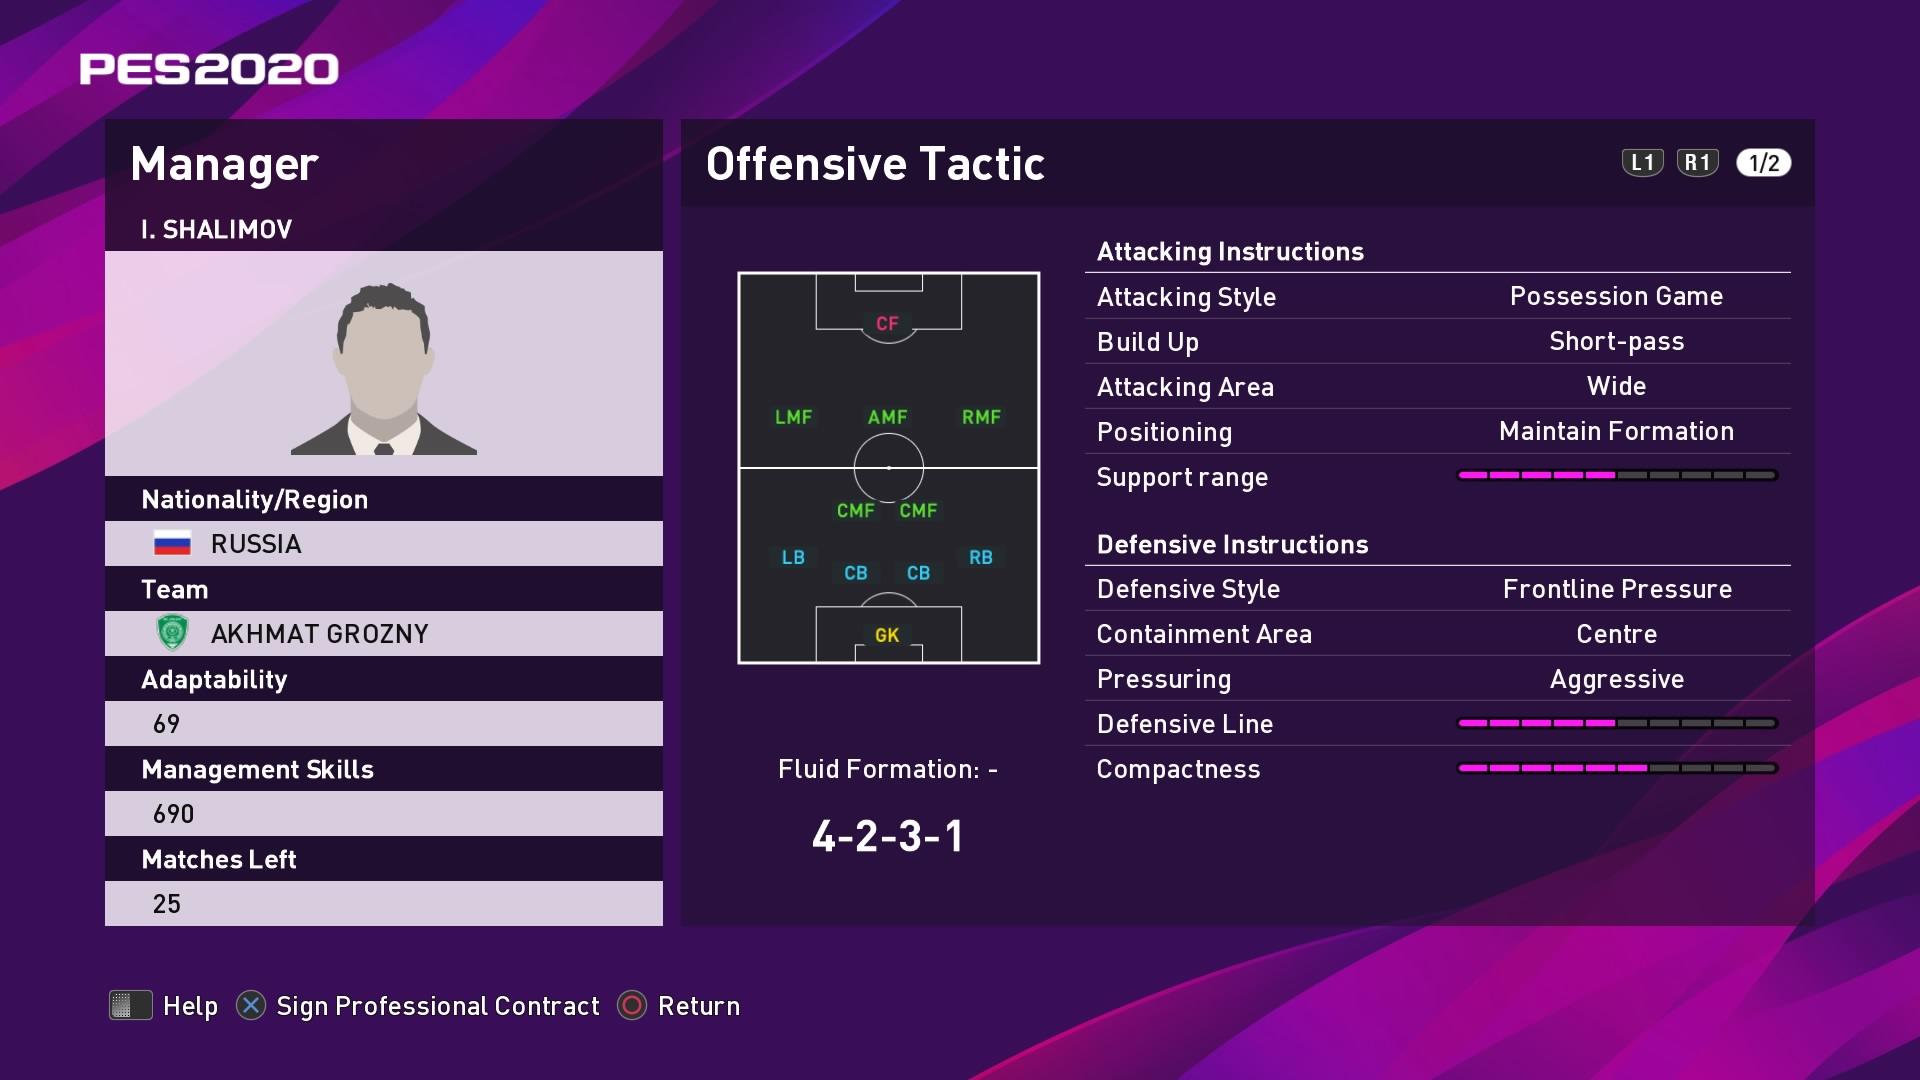 I. Shalimov (Igor Shalimov) Offensive Tactic in PES 2020 myClub